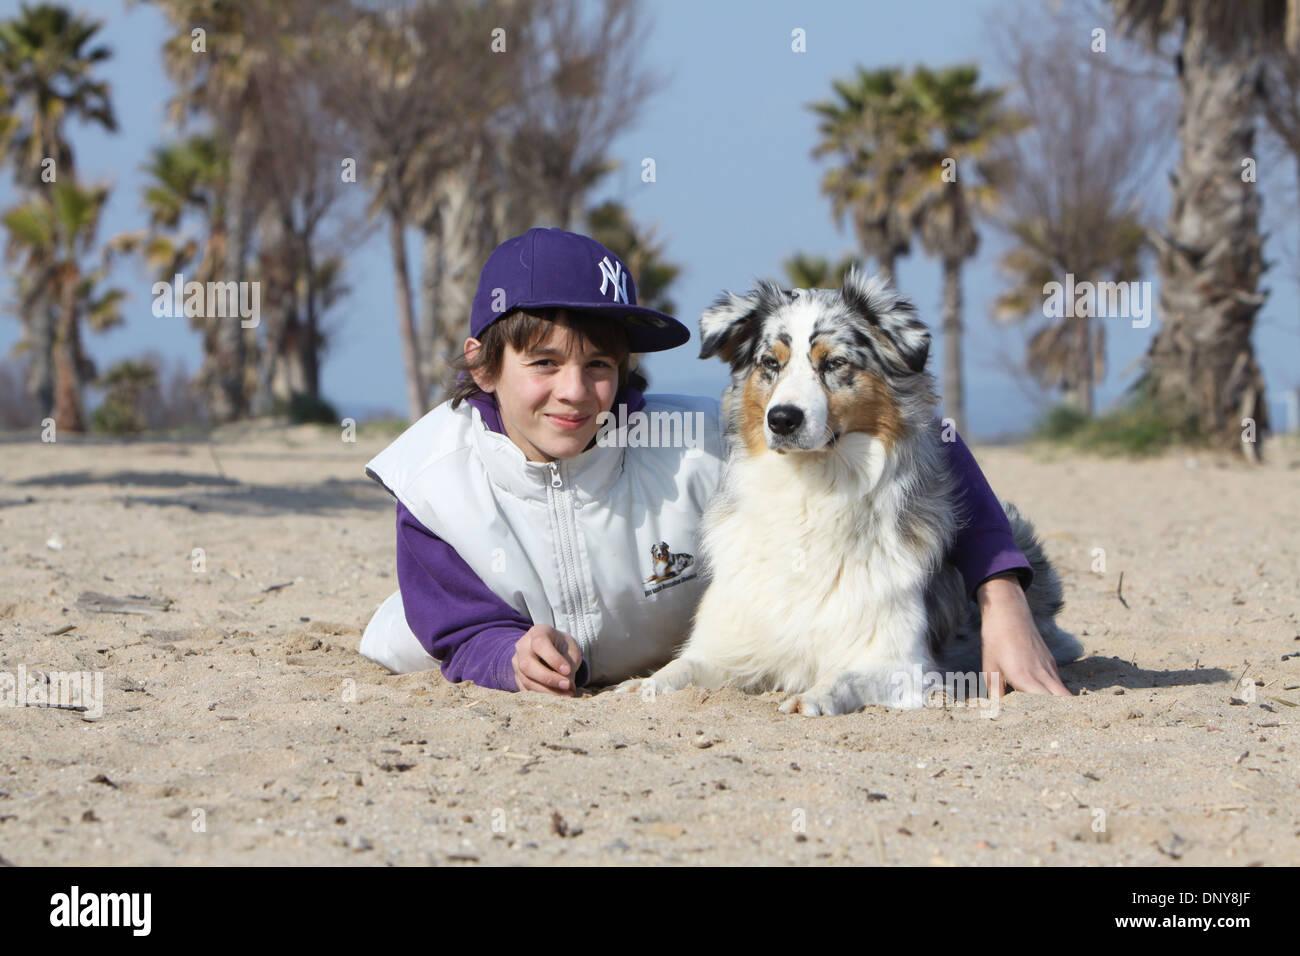 Dog Australian shepherd / Aussie  adult (blue merle) with a boy lying on the beach - Stock Image